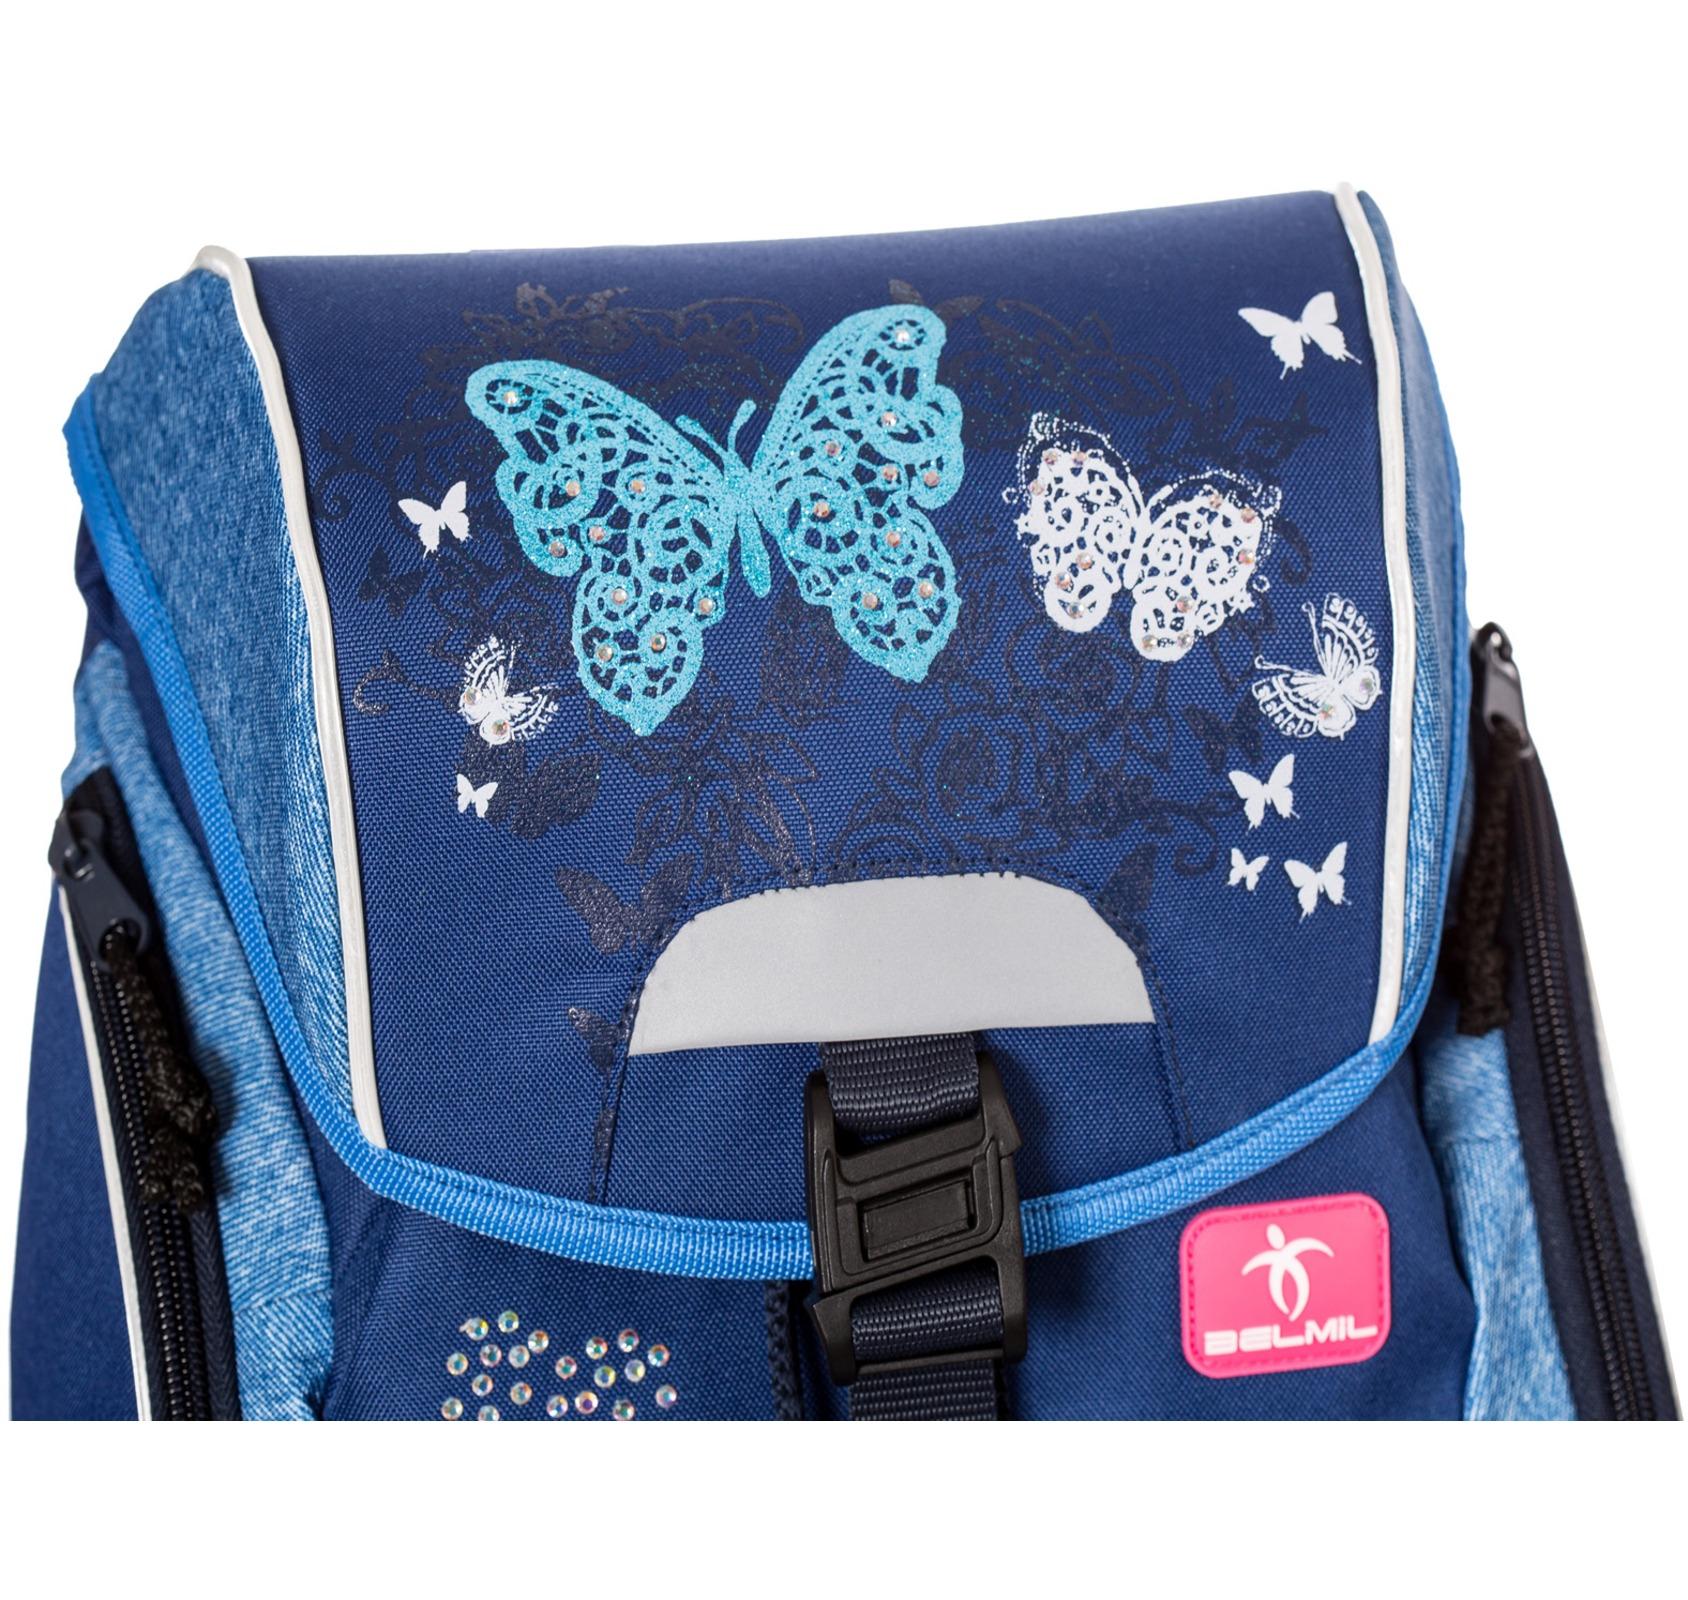 Ранец-рюкзак Belmil 404-31/467 цвет Butterfly Новинка, - фото 3